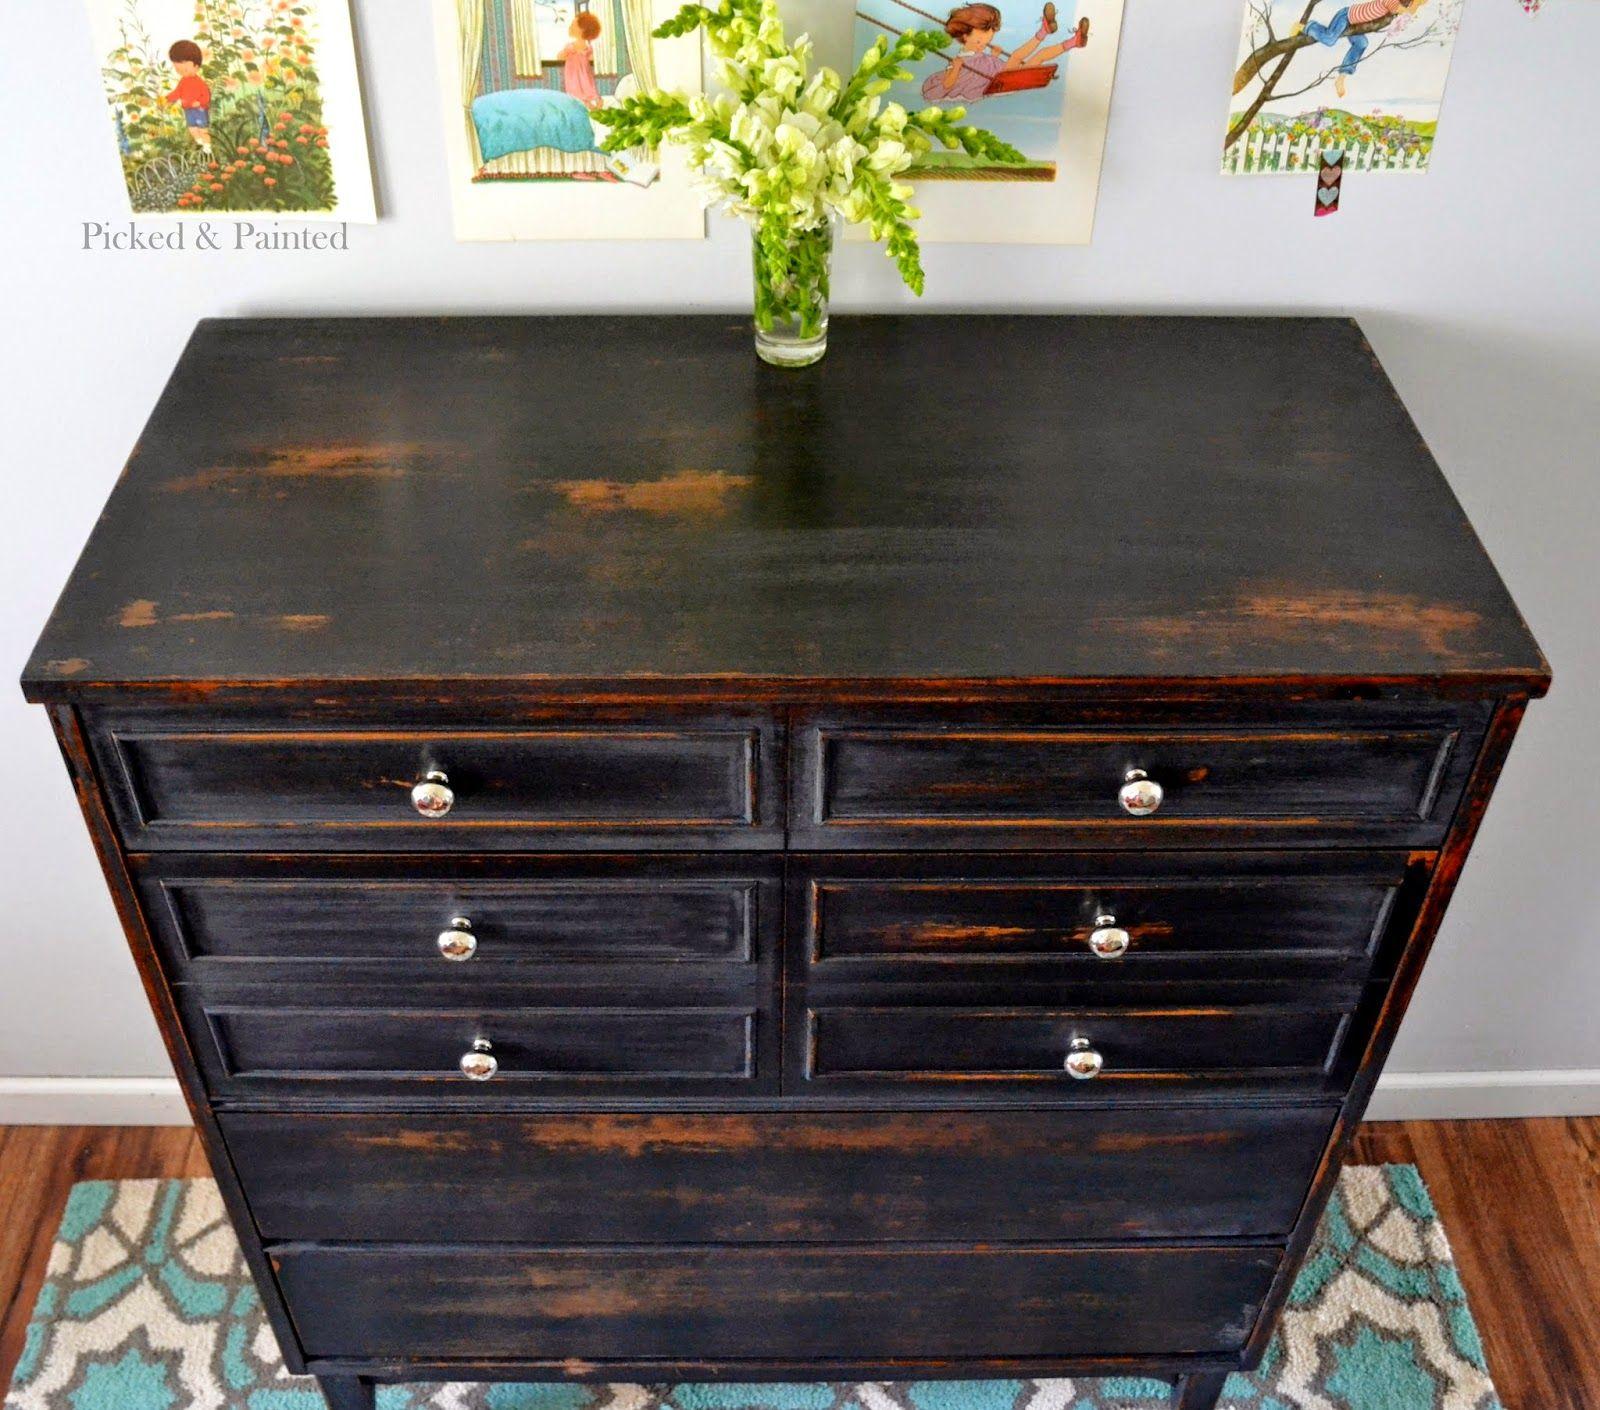 Paint colors for distressed furniture - Helen Nichole Designs Dresser In Pitch Black Milk Paint